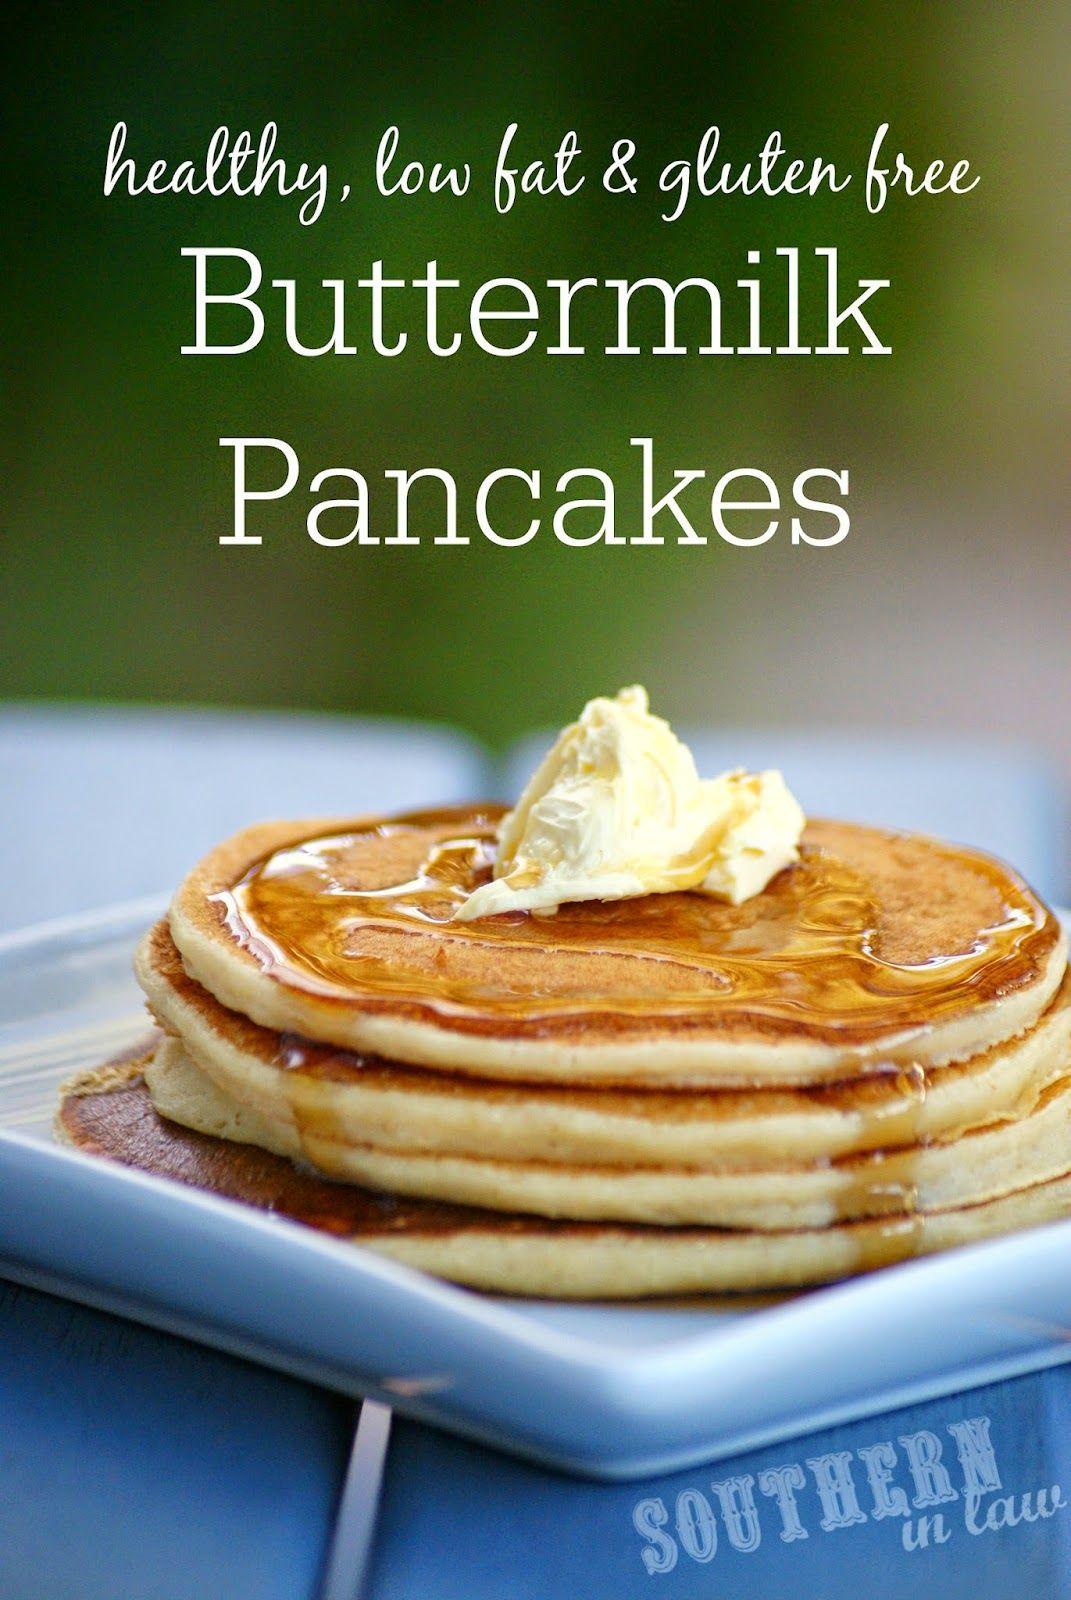 Recipe Healthy Buttermilk Pancakes Buttermilk Pancakes Recipes Gluten Free Buttermilk Pancakes